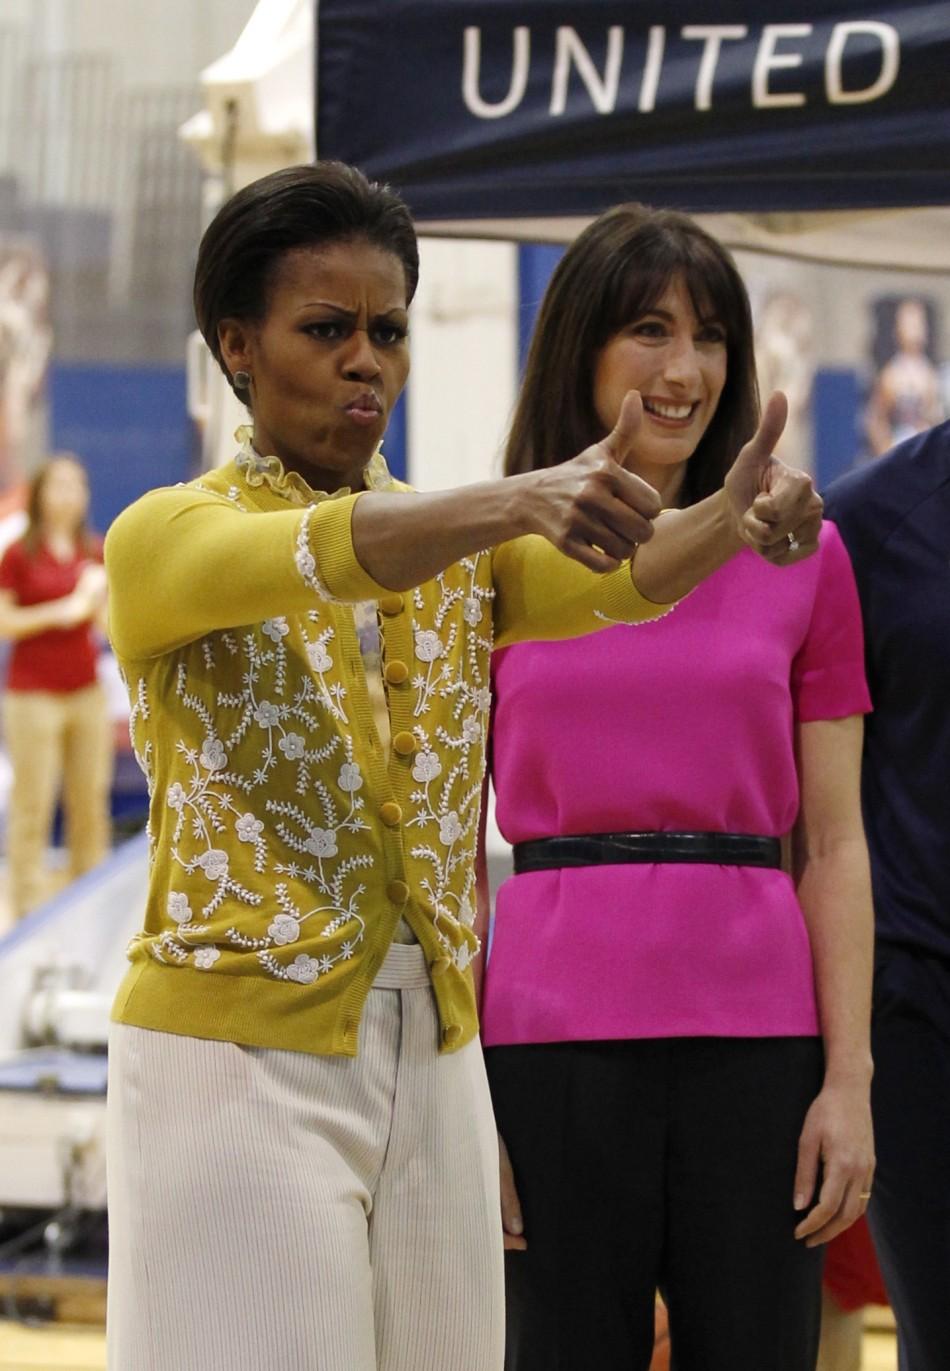 Michelle Obama and Samantha Cameron